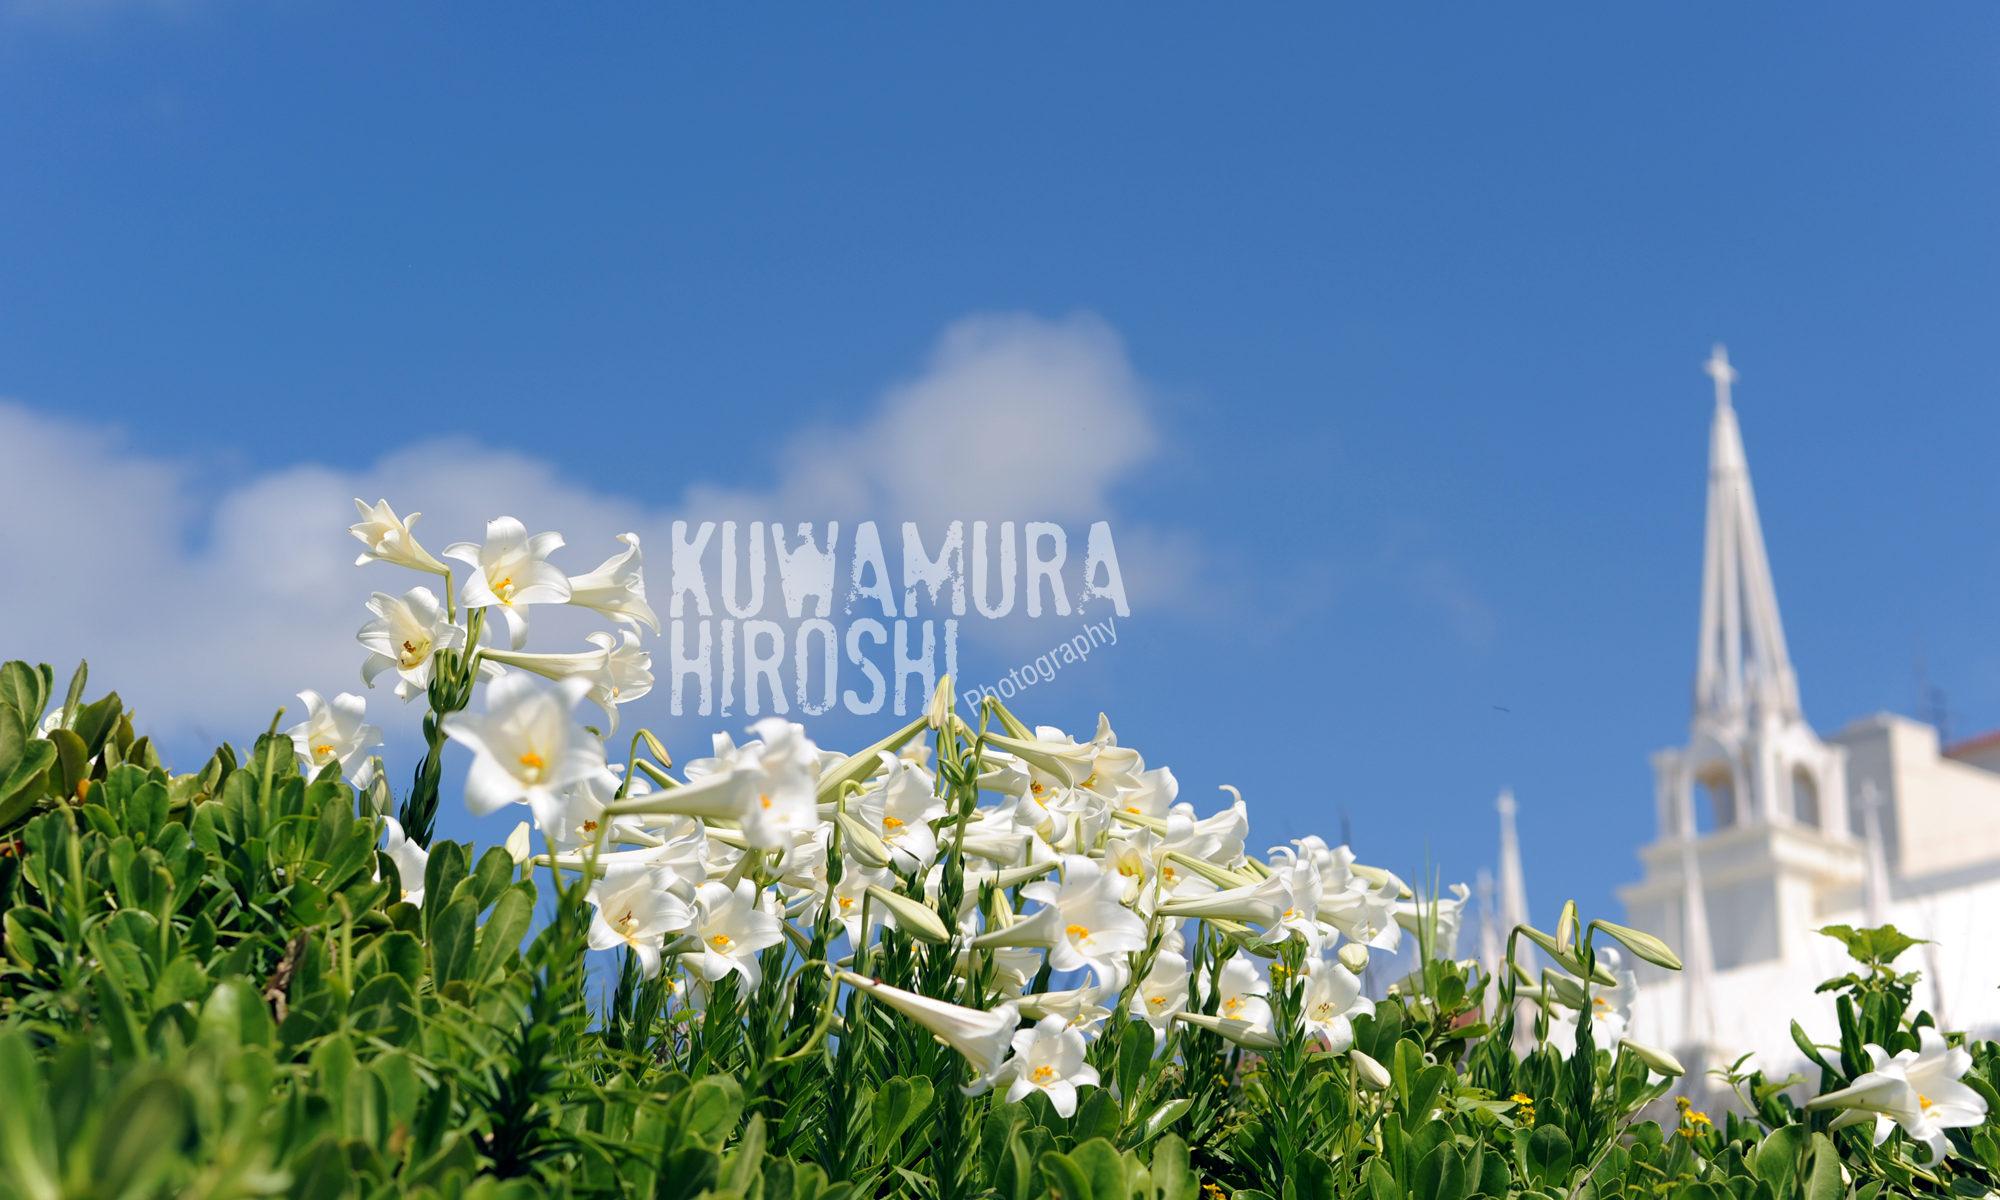 kuwamuraphotography.com